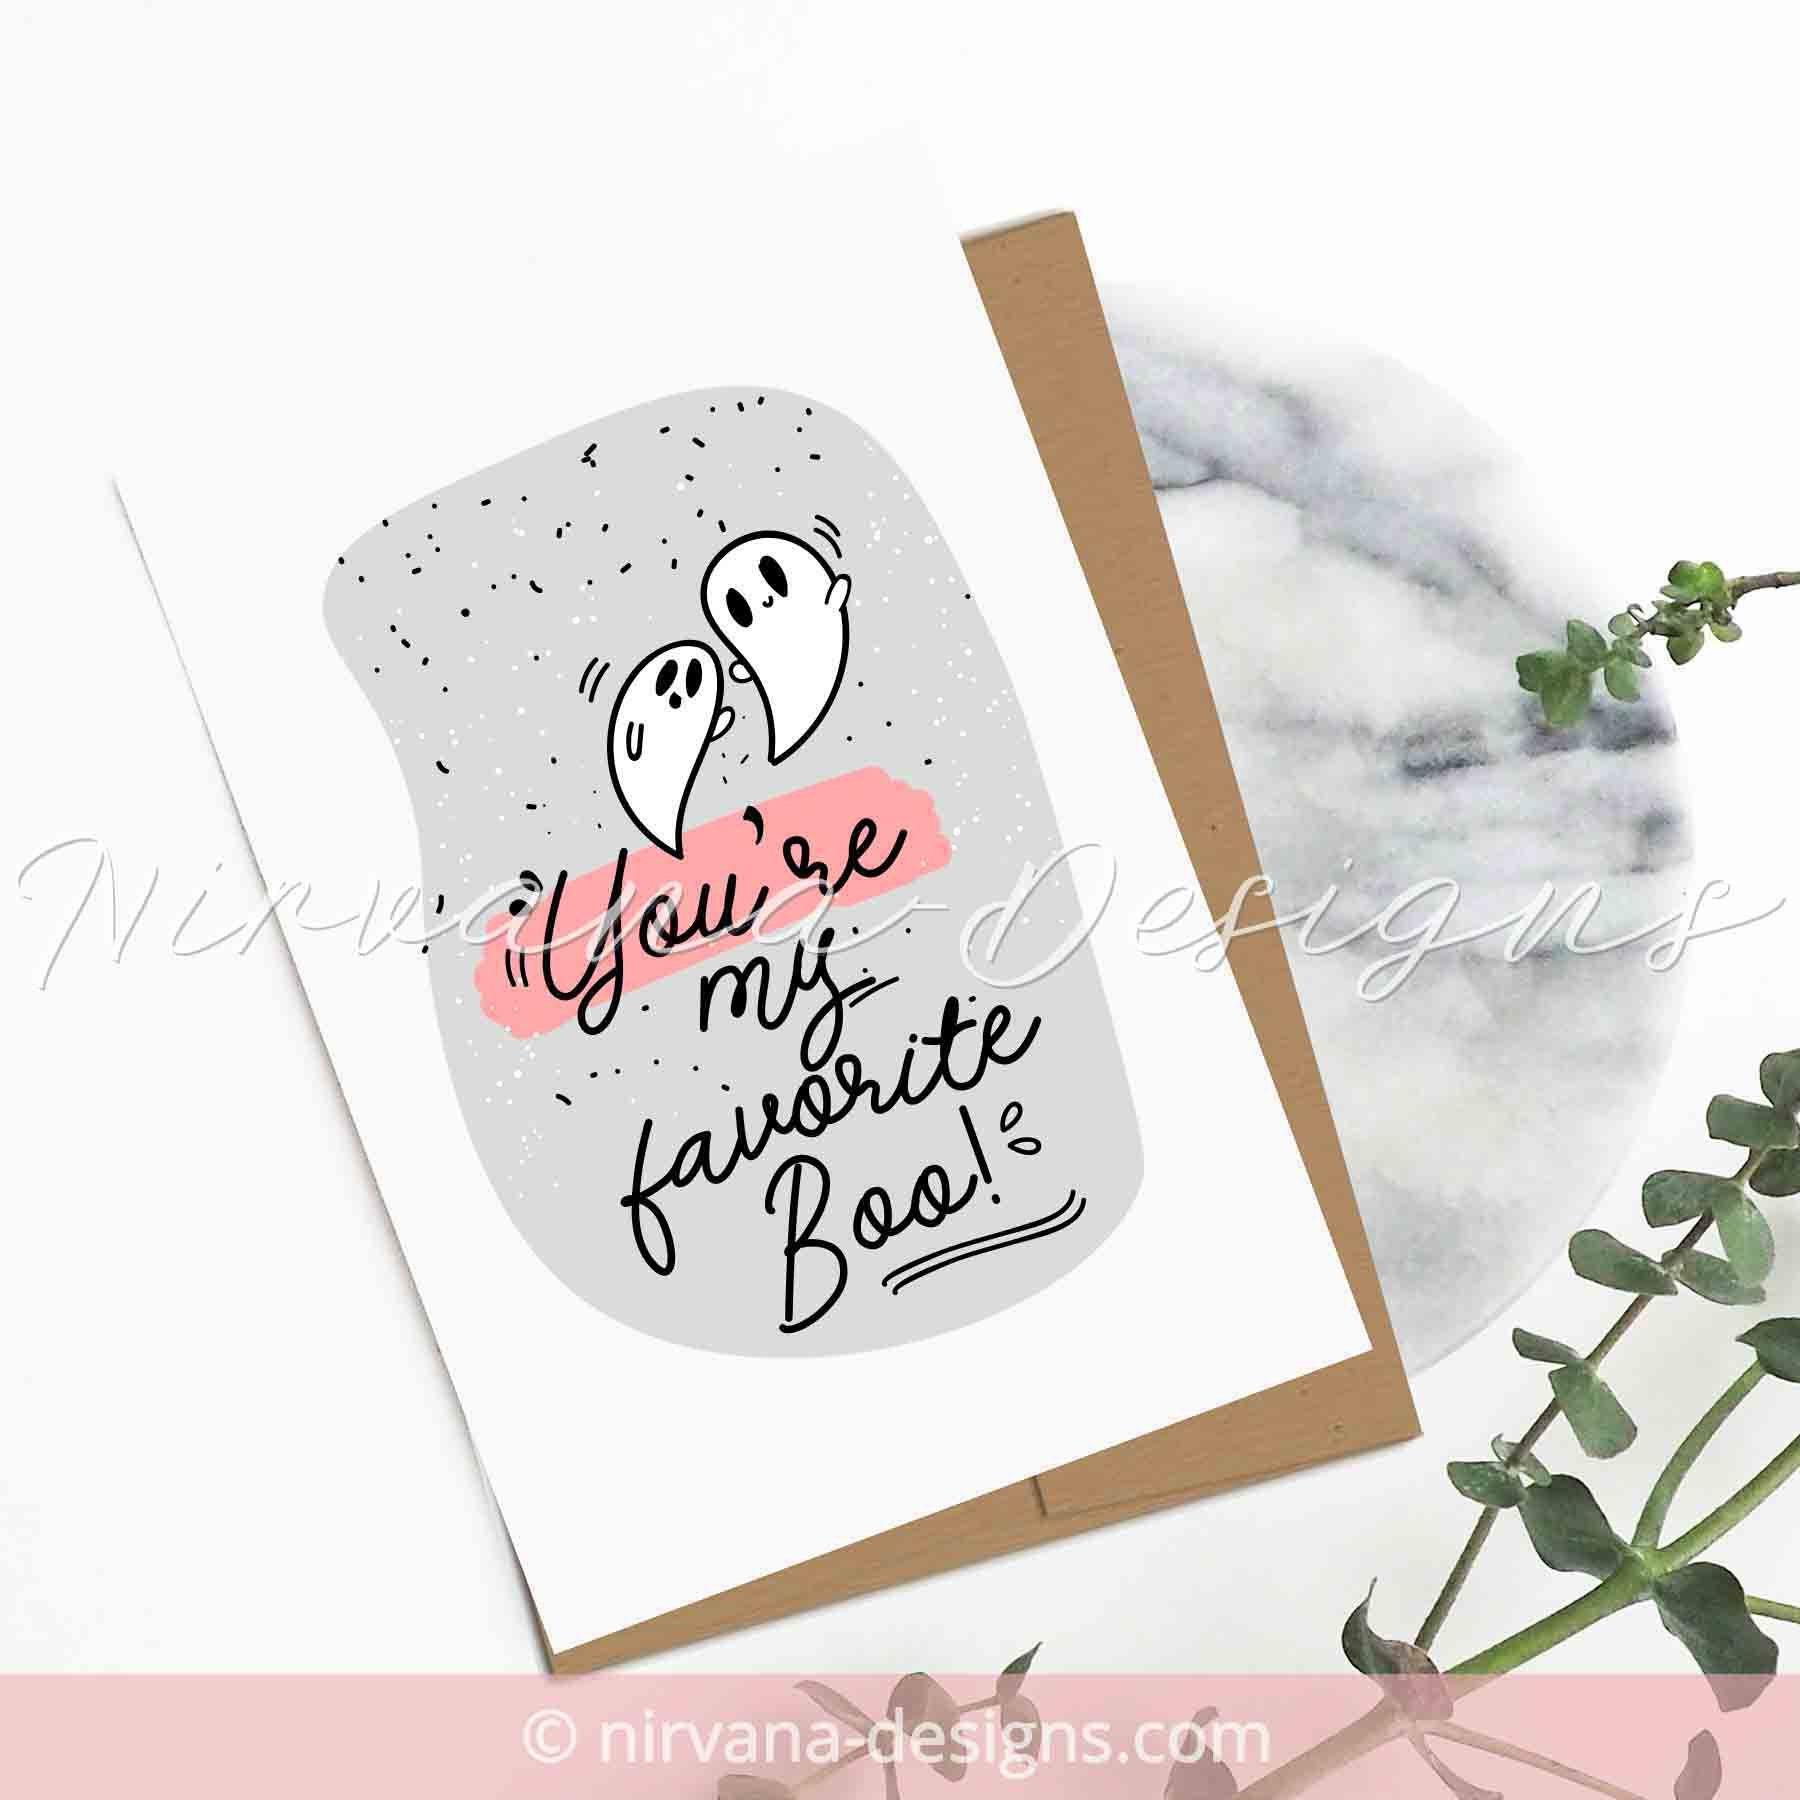 Halloween love card handmade anniversary card for husband wife